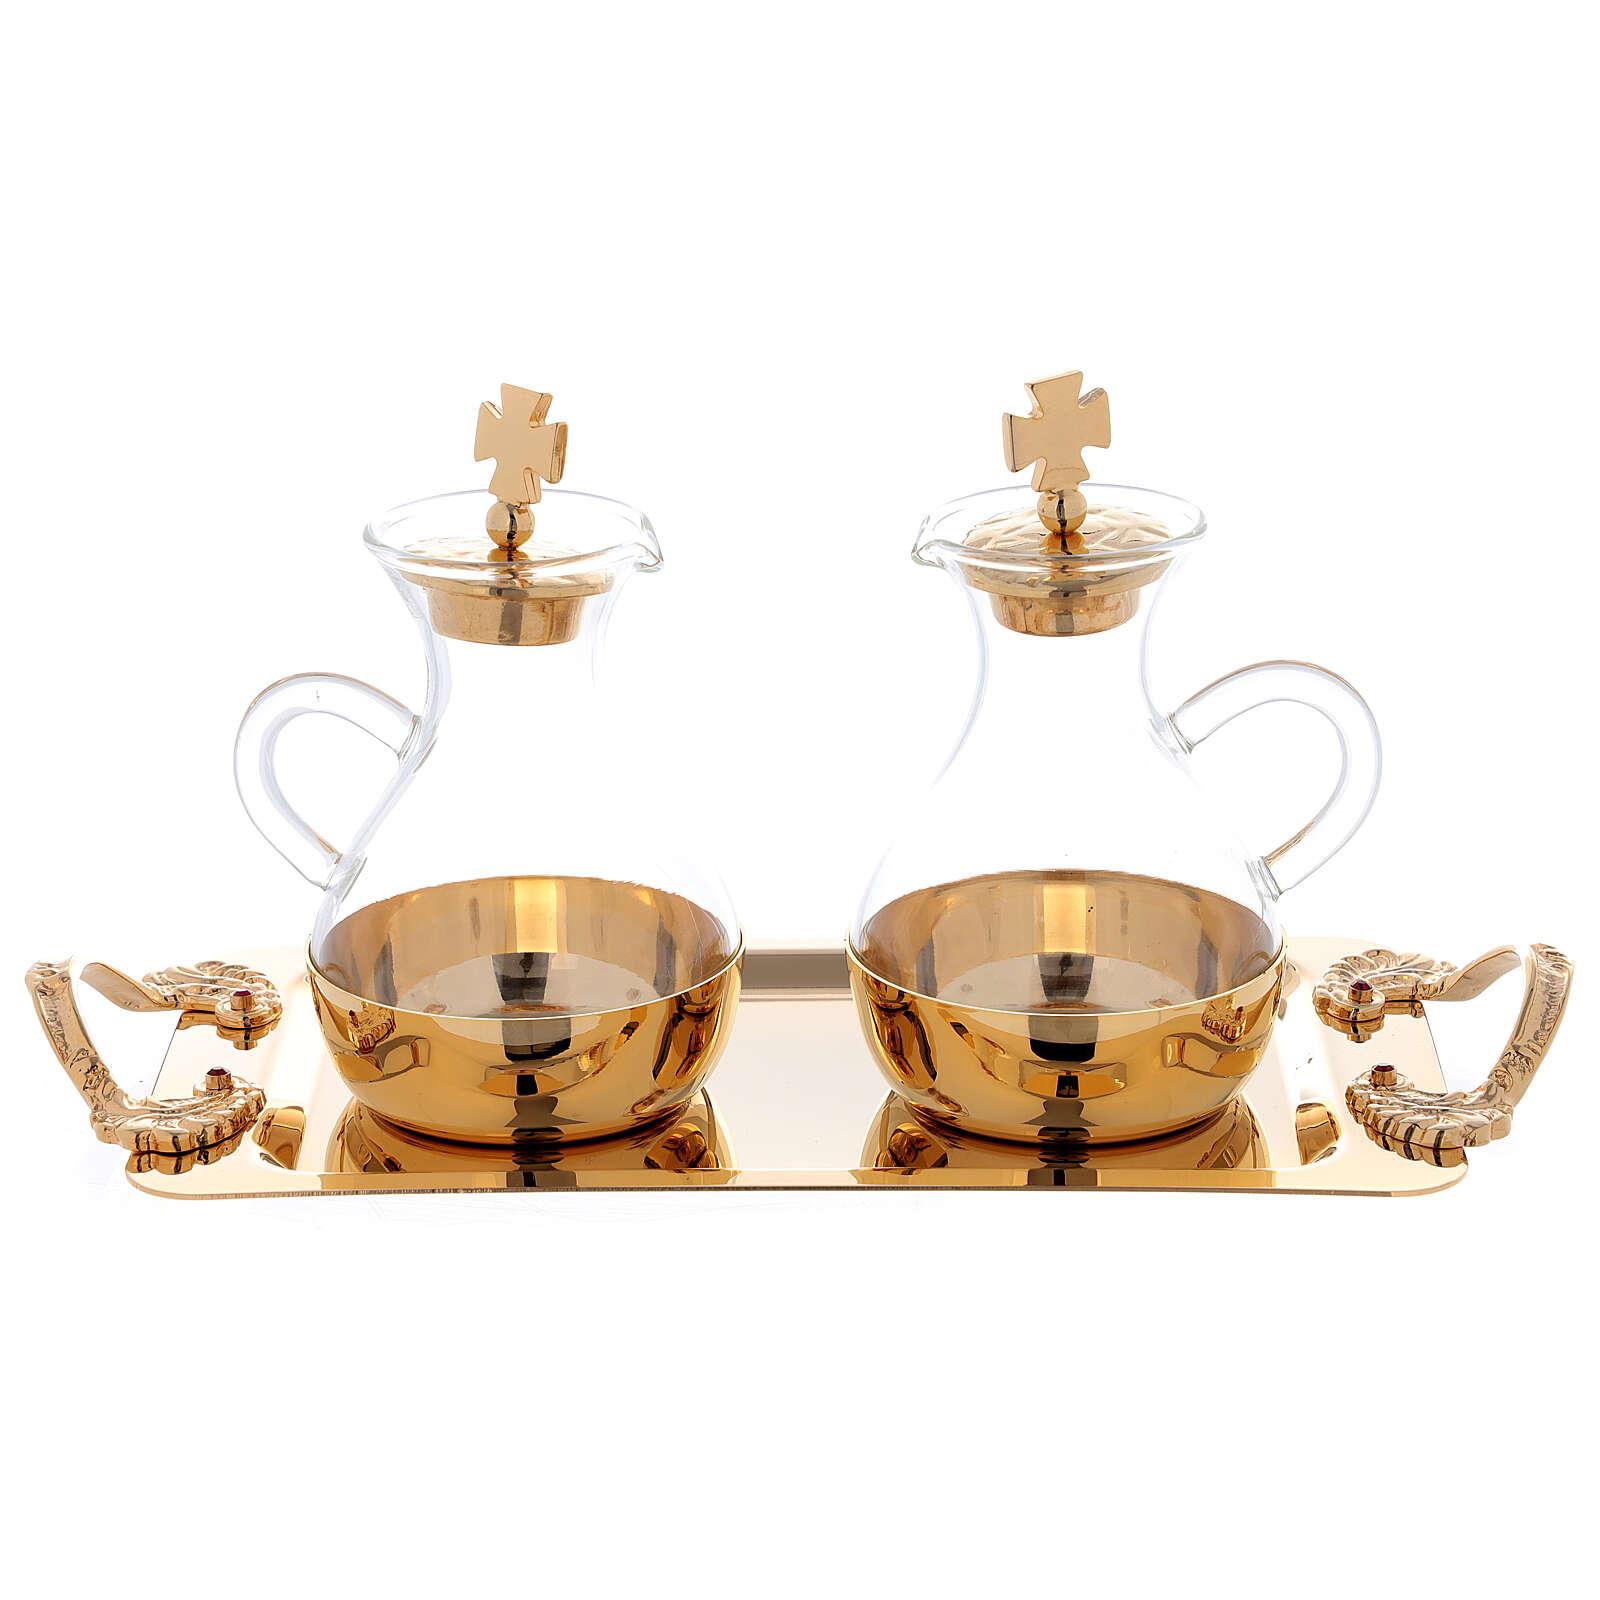 Rome cruet set 24-karat gold plating 4